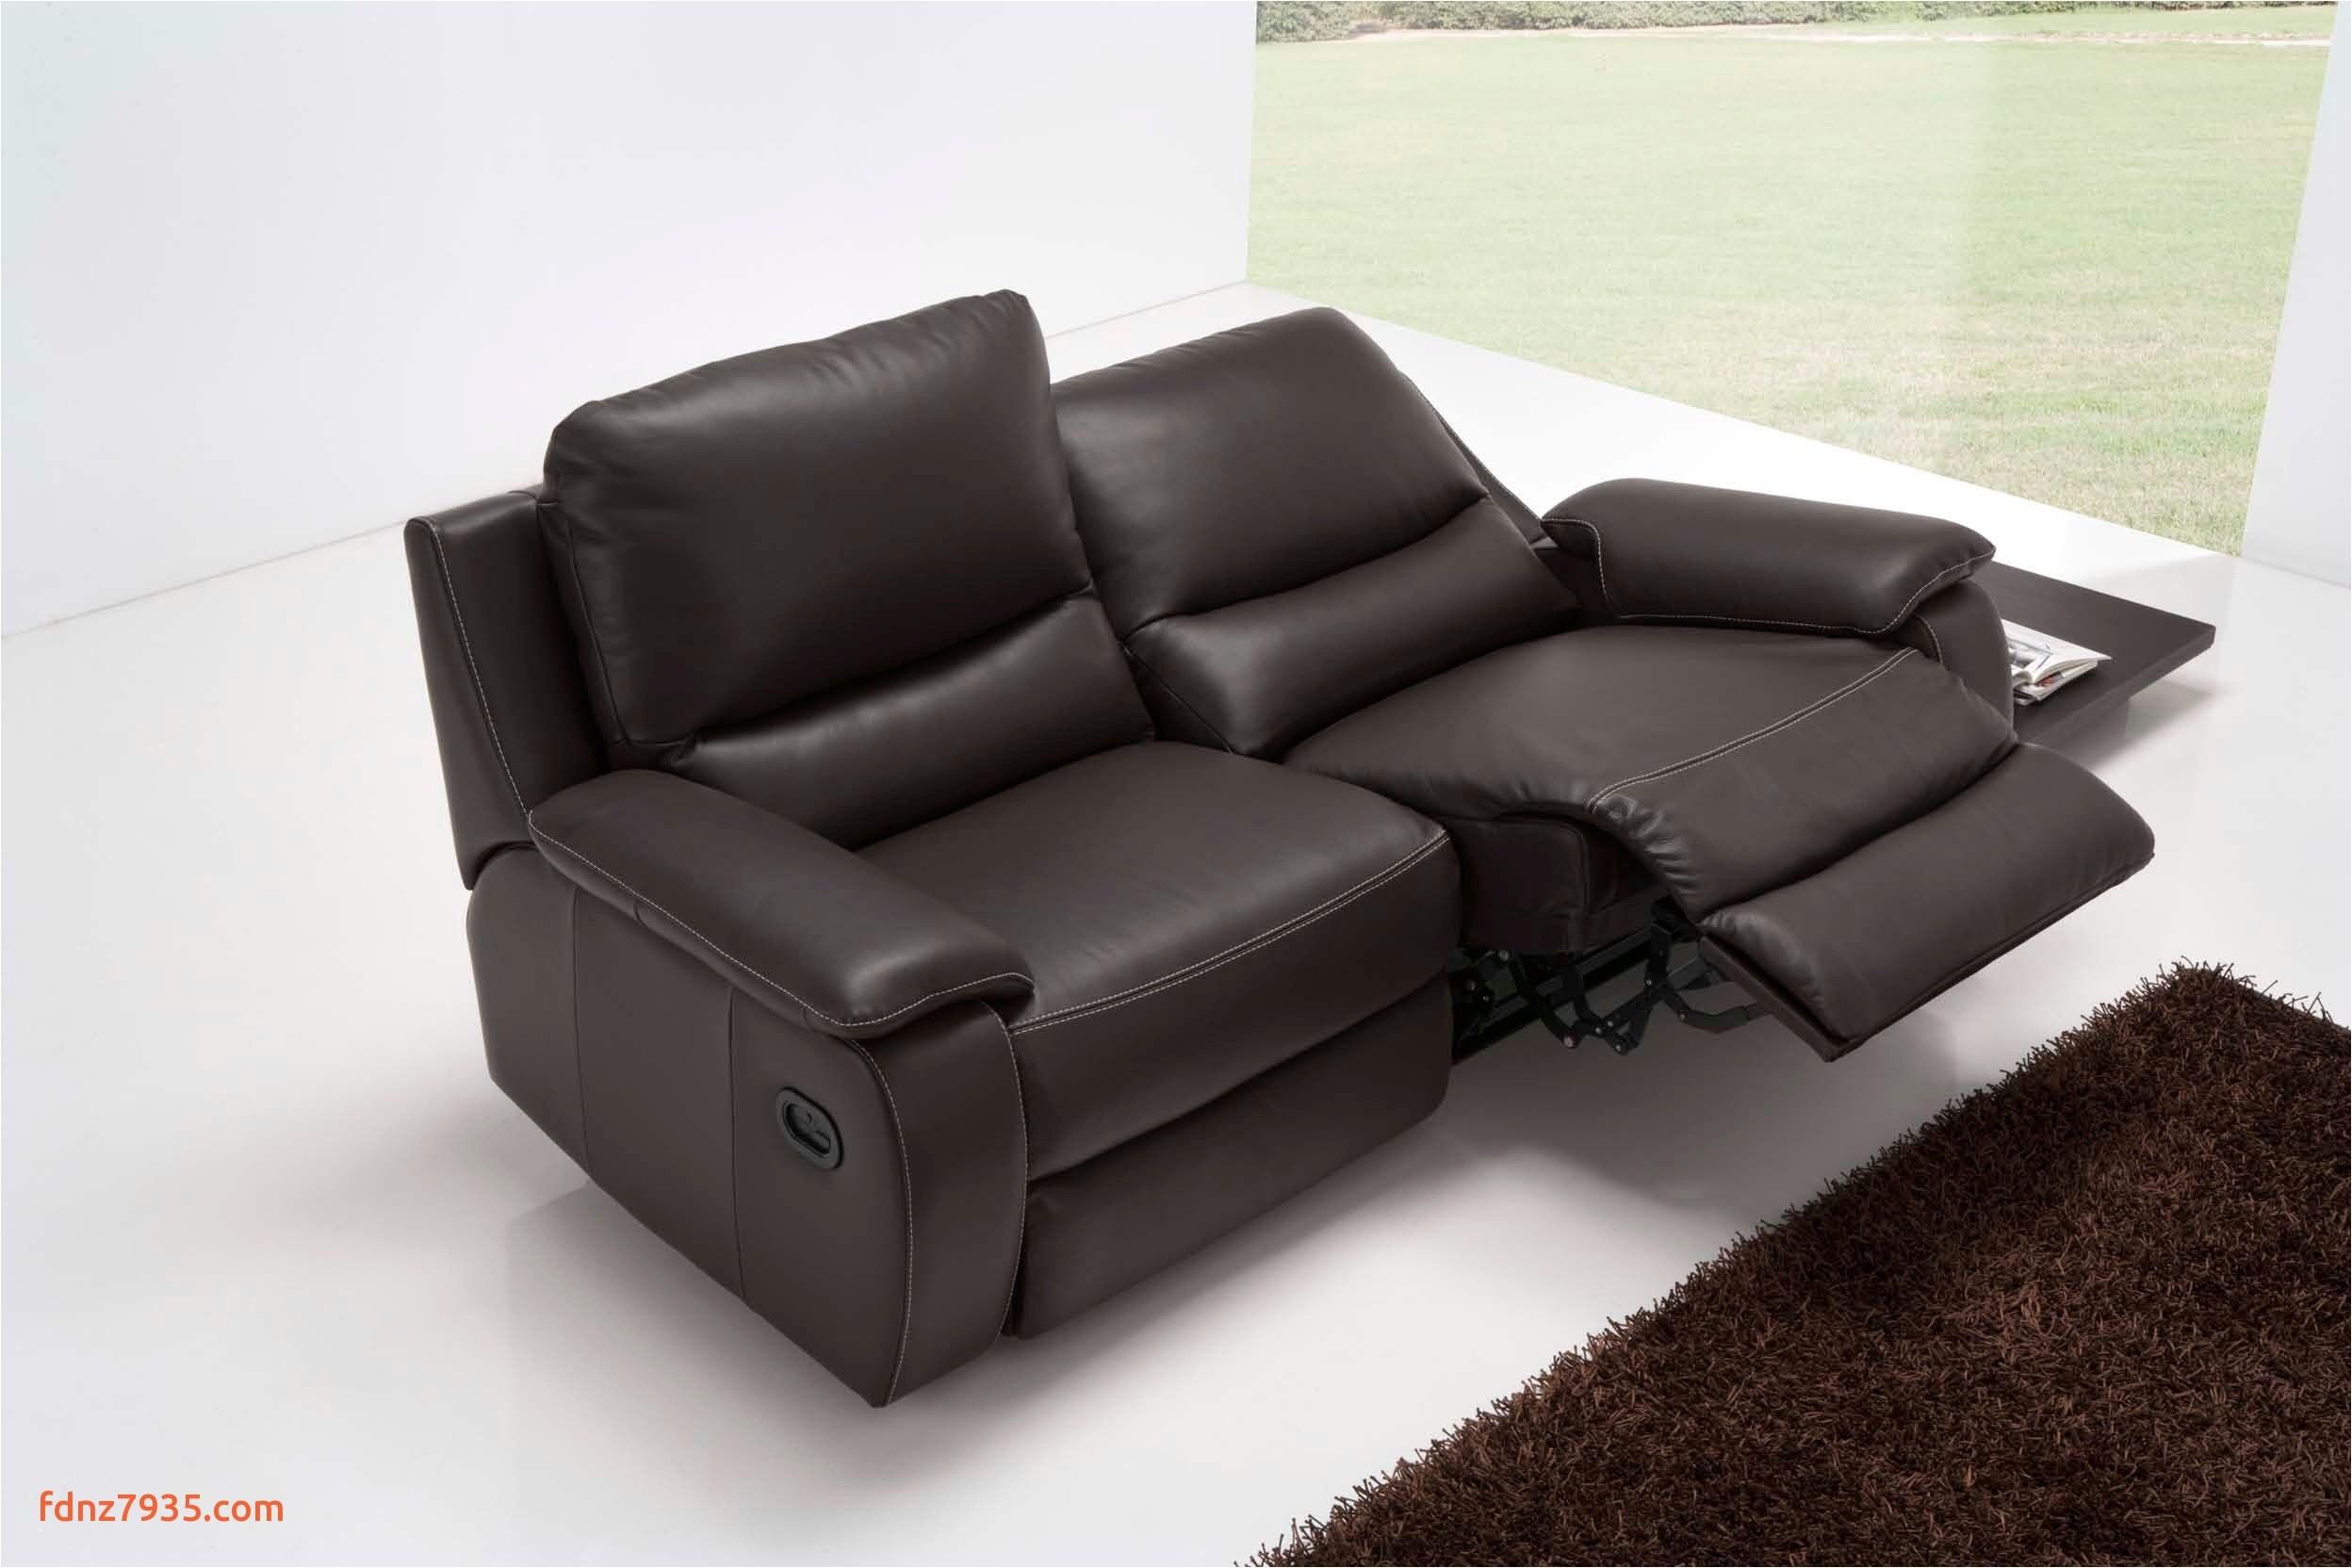 free full size of sofa sthle sitzer sofa und zwei sthle gnstige large size  of sofa